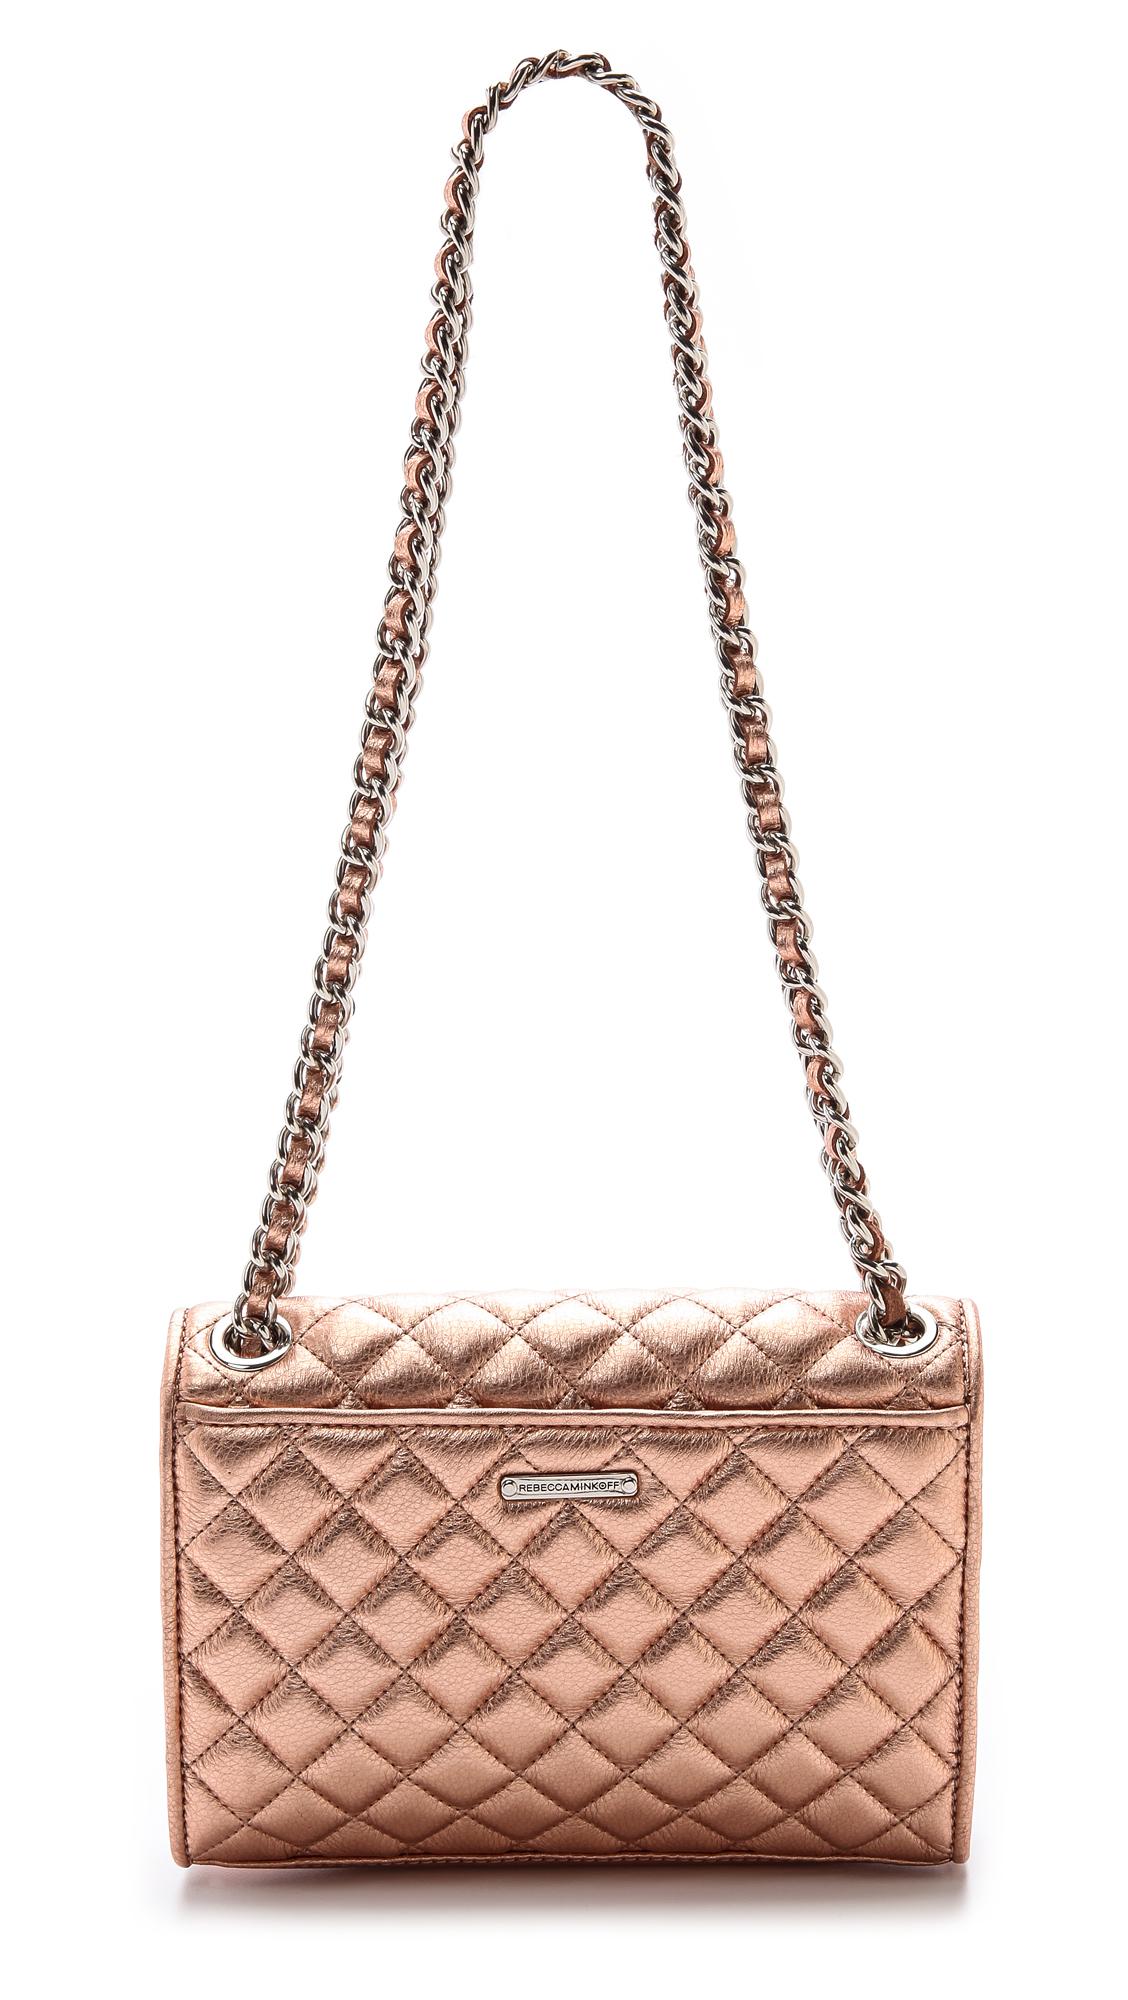 67f9bec17c81 Lyst - Rebecca Minkoff Quilted Mini Affair Bag Rose Gold in Pink